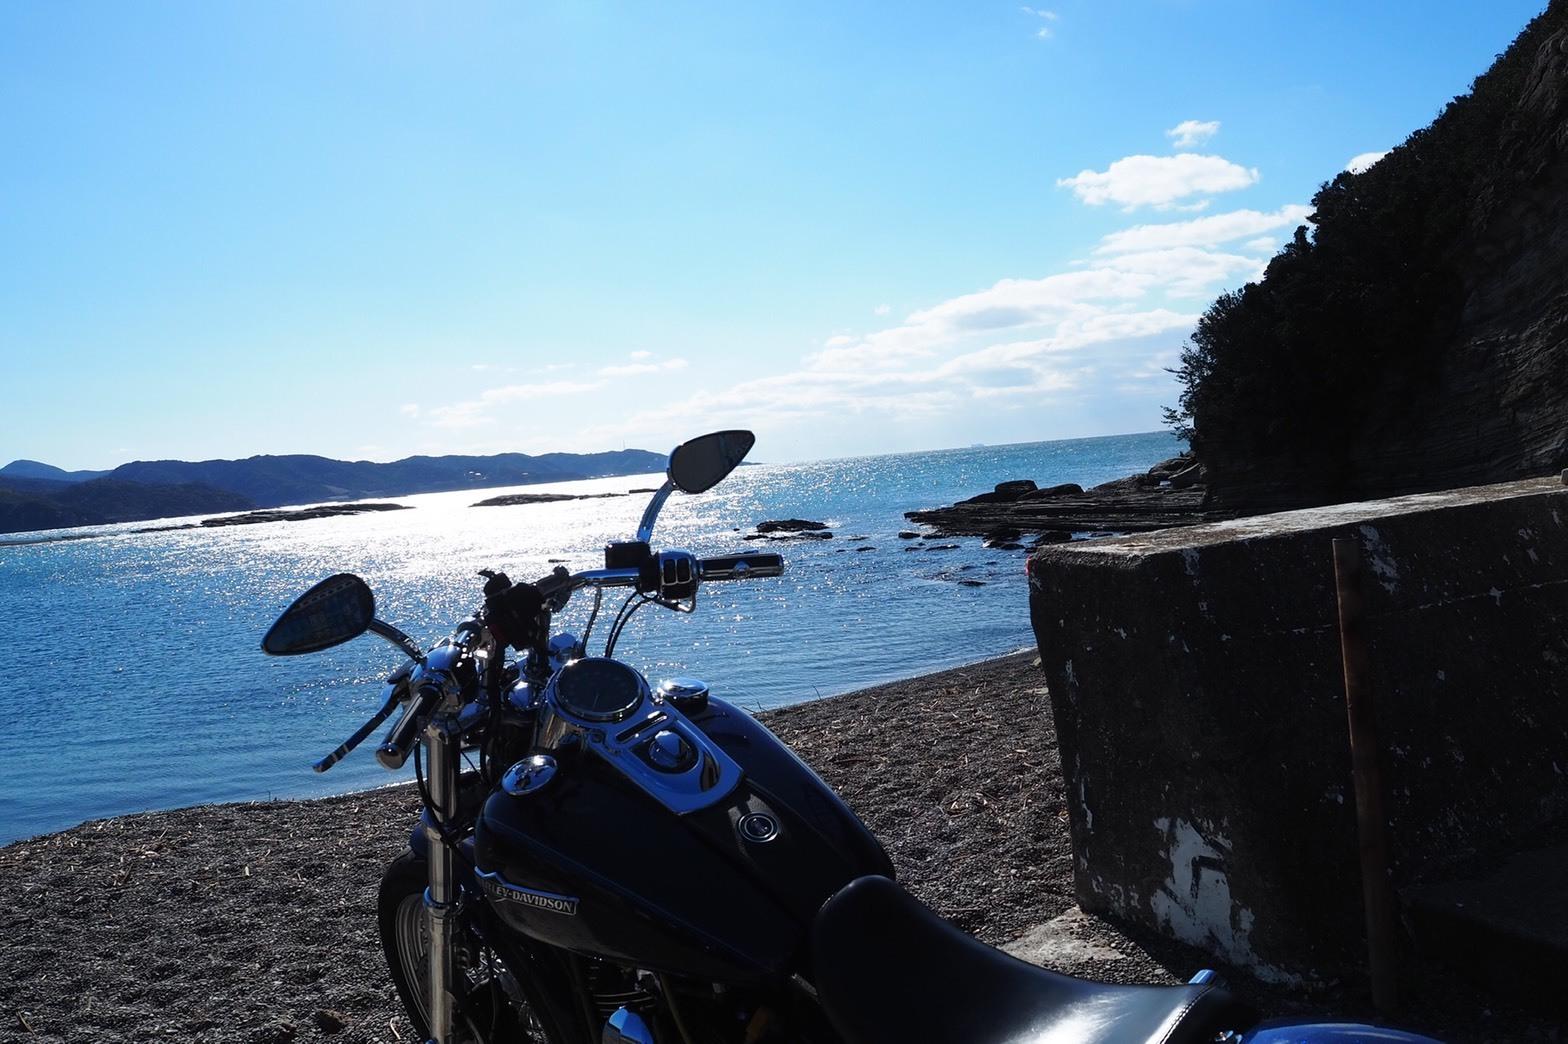 harleydavidson-motorcycle-touring-blog-wakayama-shigarami-beach.jpg